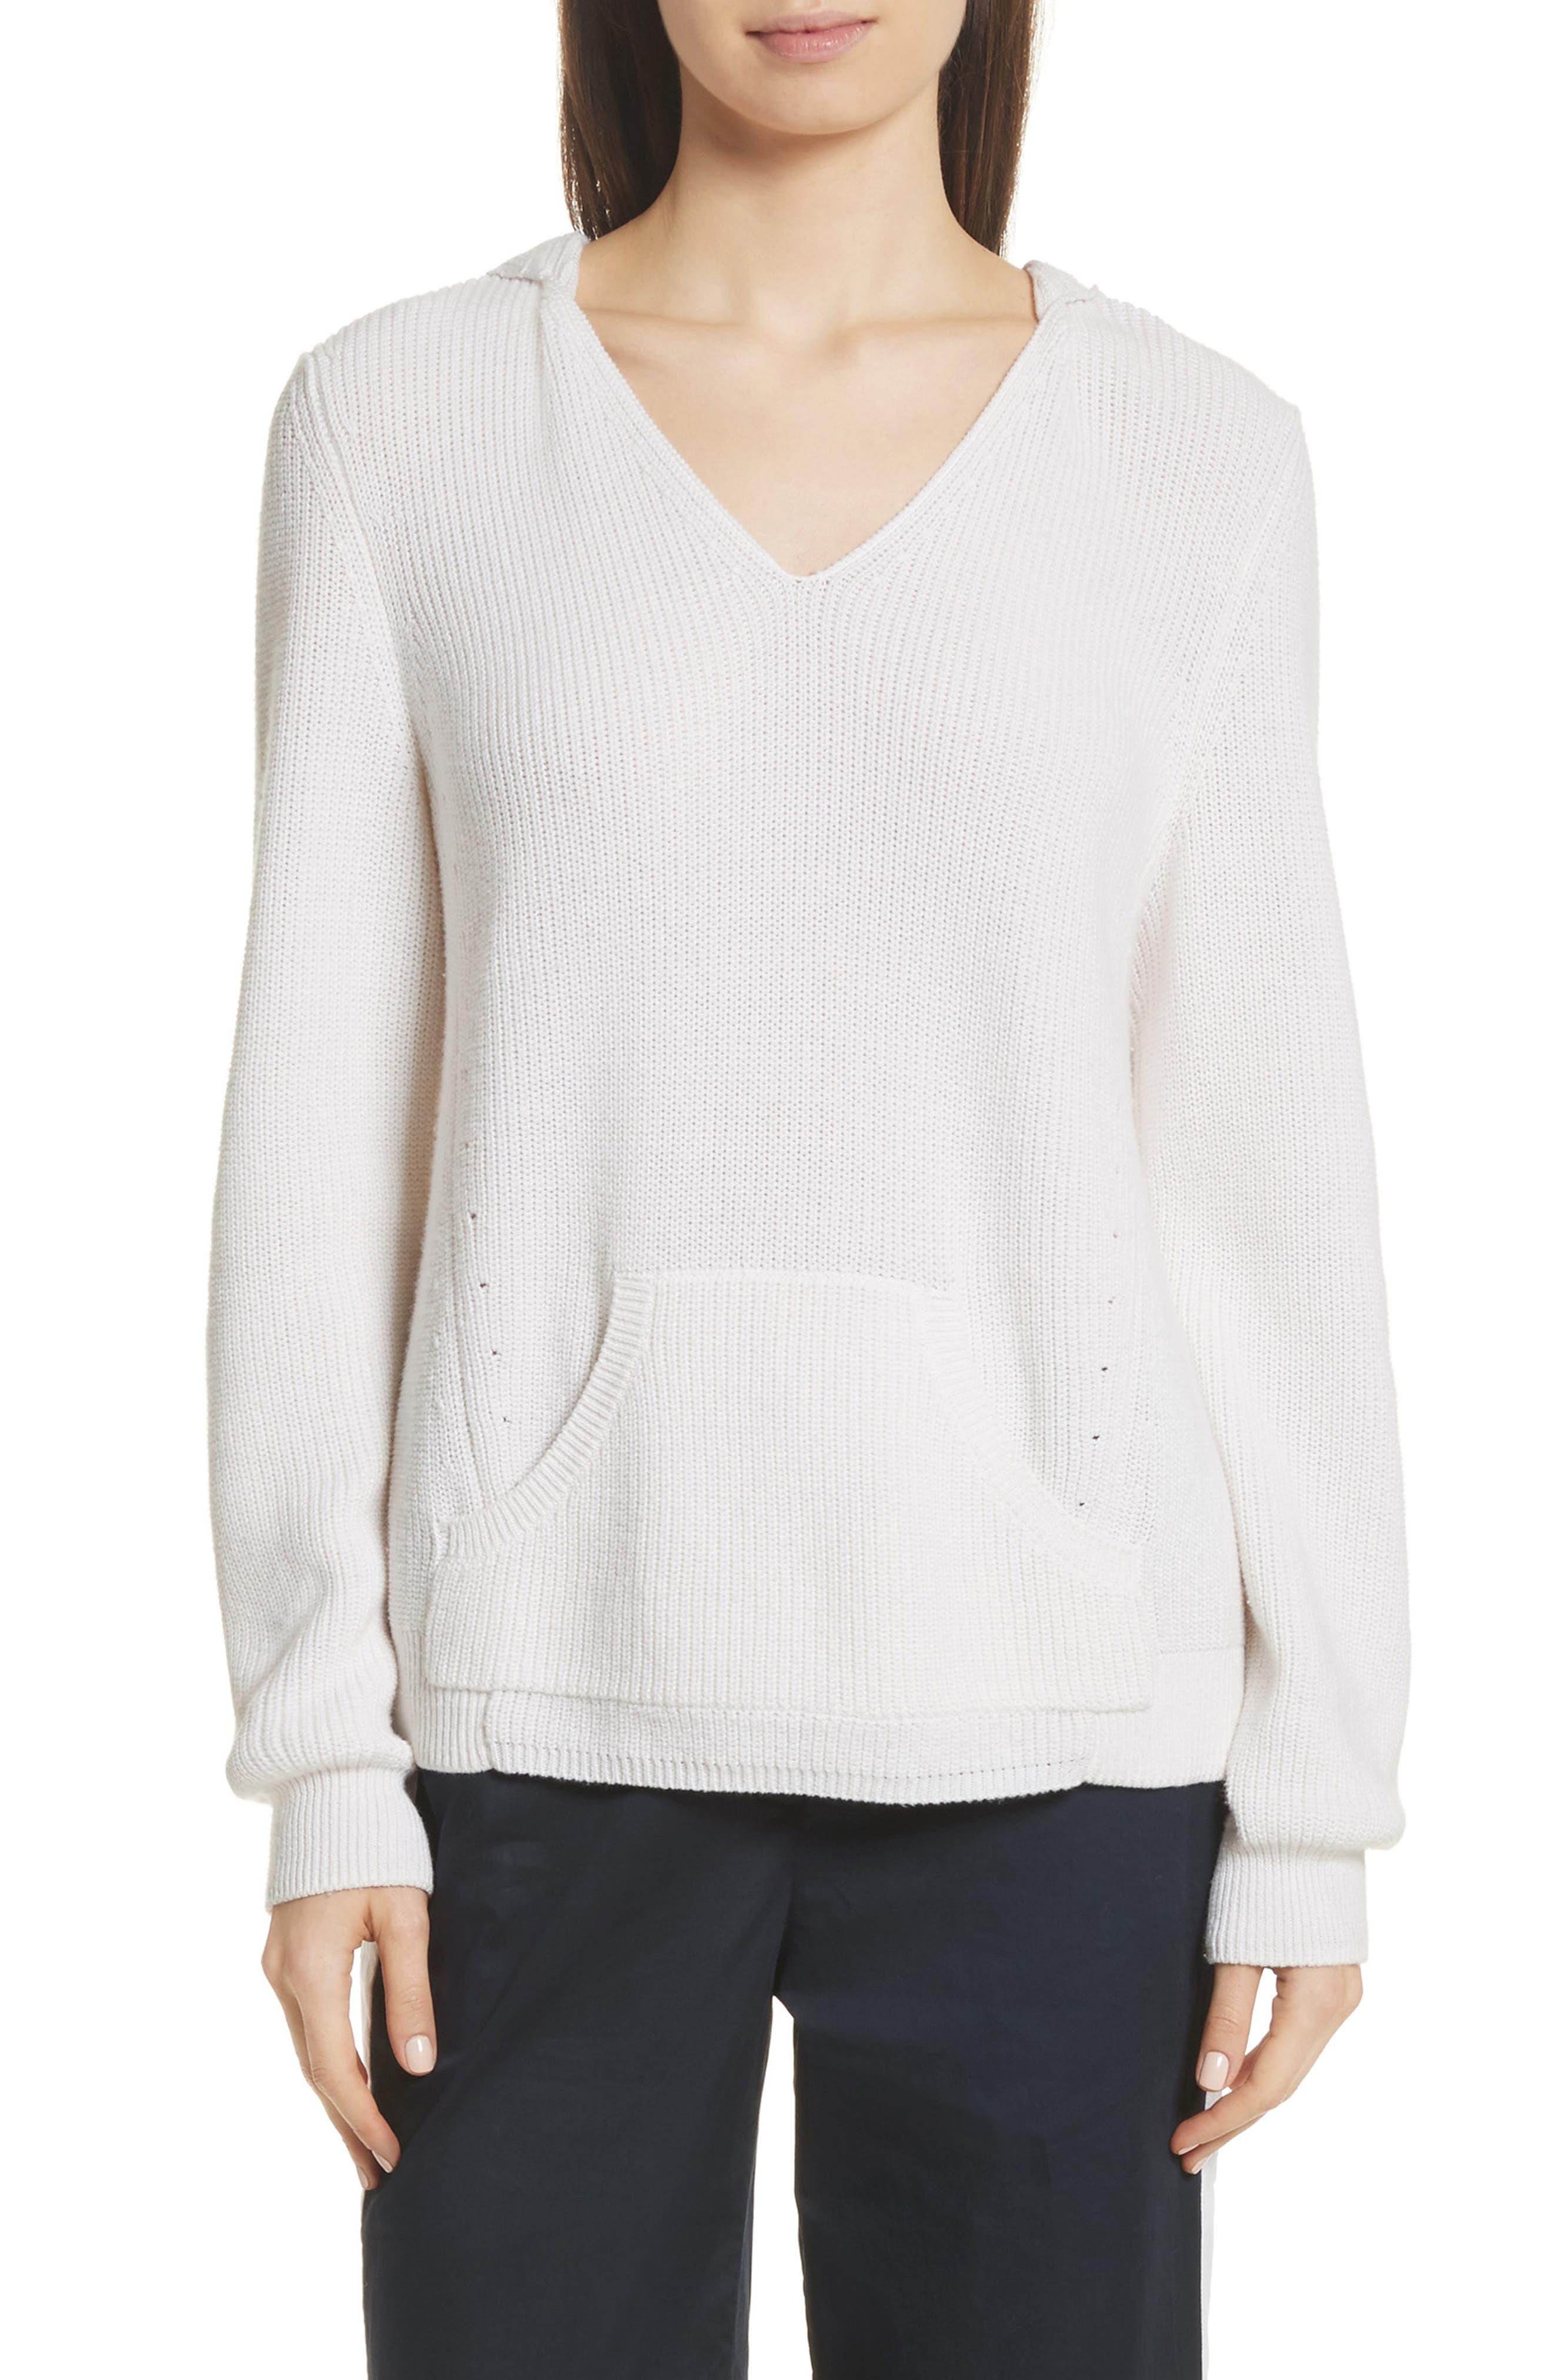 Equipment Octavia Hooded Sweater